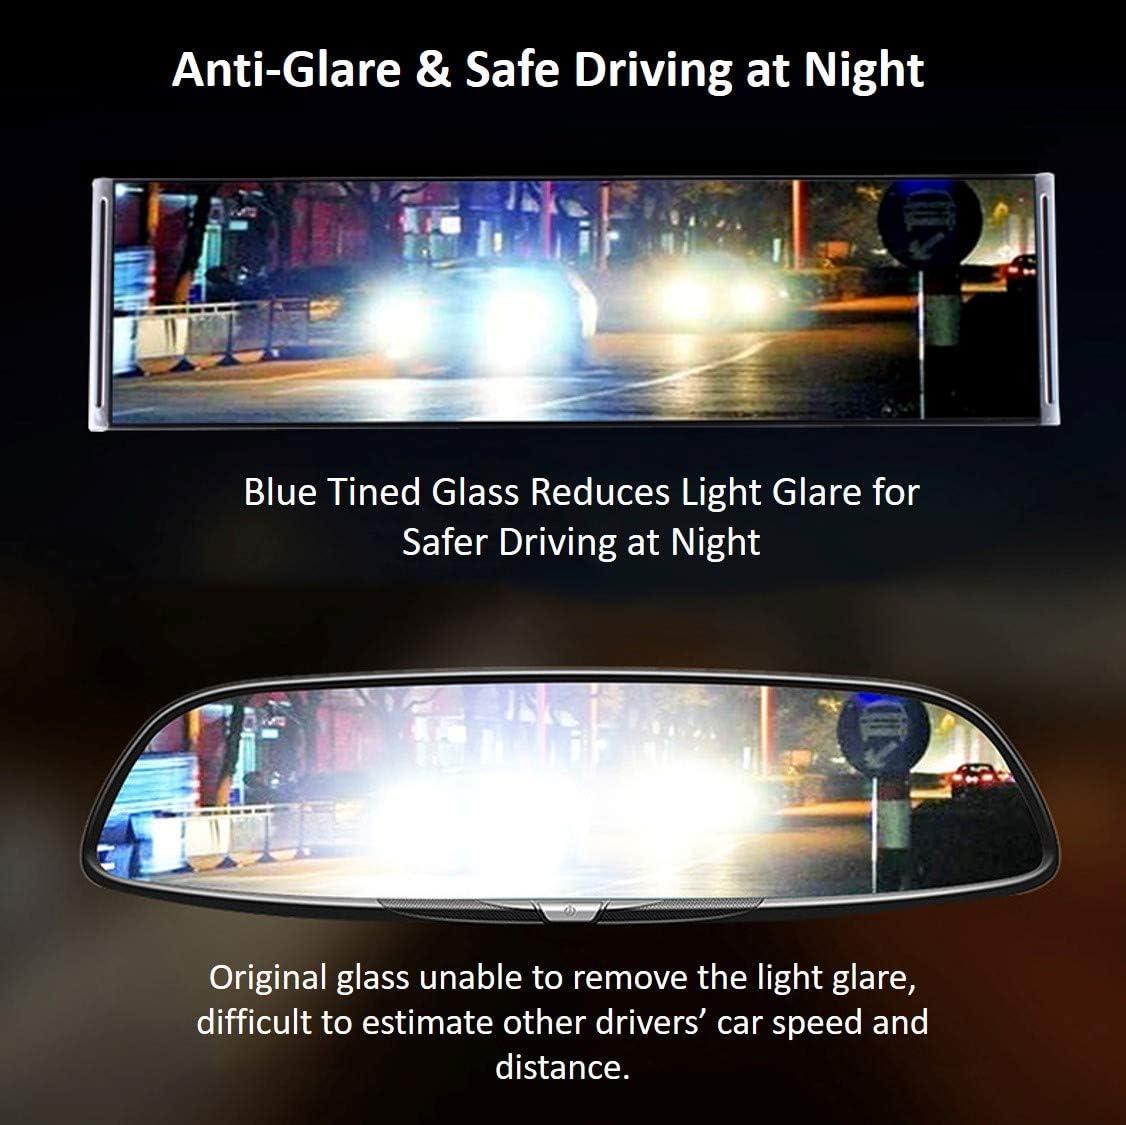 SUV Wide Angle Car Rear View Mirror Anti-Glare Universal Interior Clip On RearView Mirror for Car Truck 30 cm x 8 cm, 11.8 L x 3.15 H